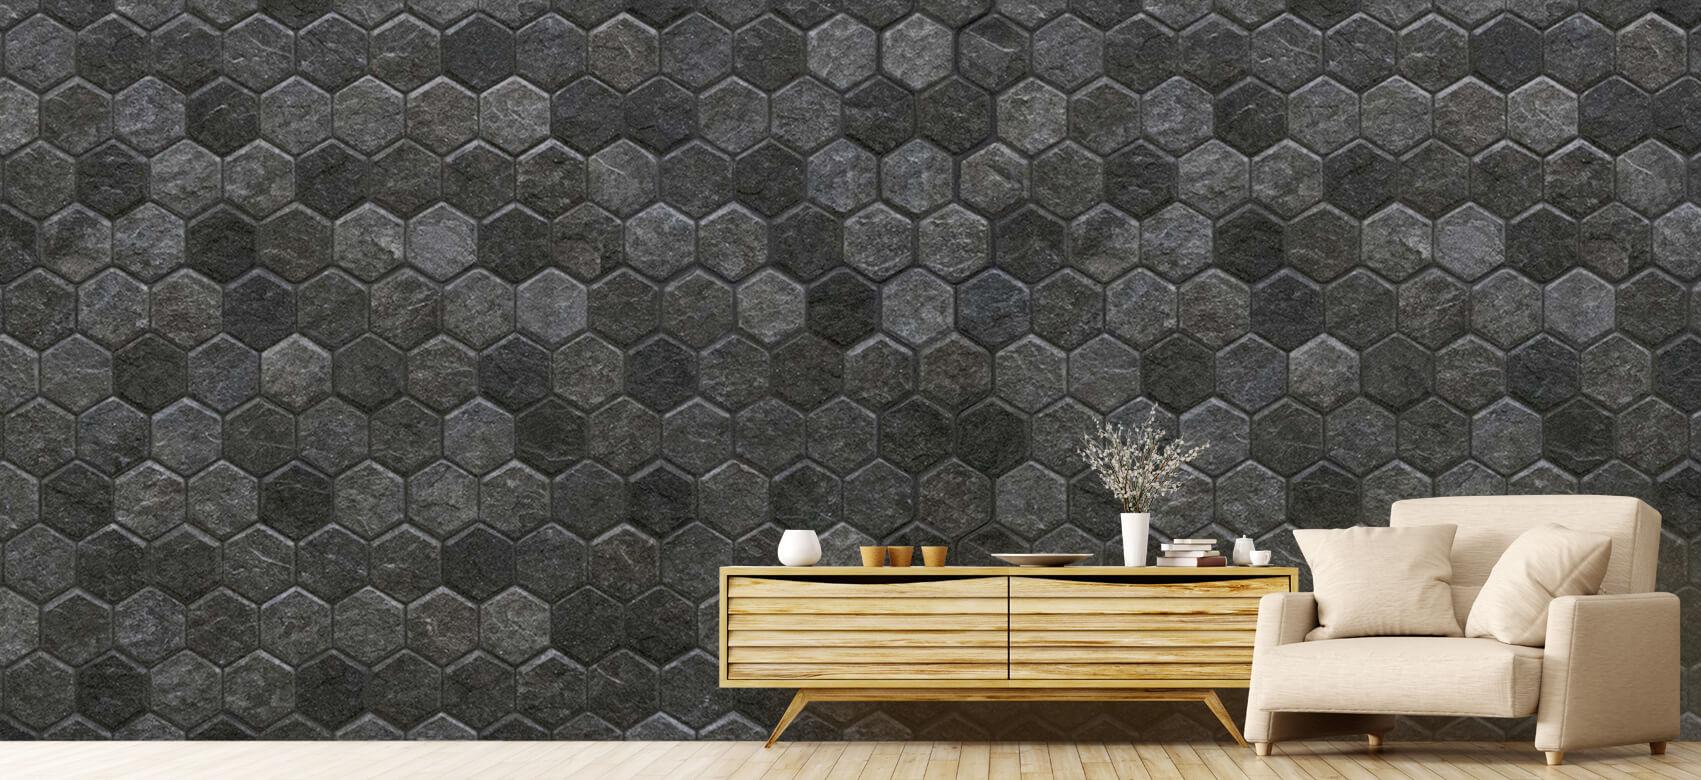 Beton, hout en steen Kleine zwarte steentjes 6